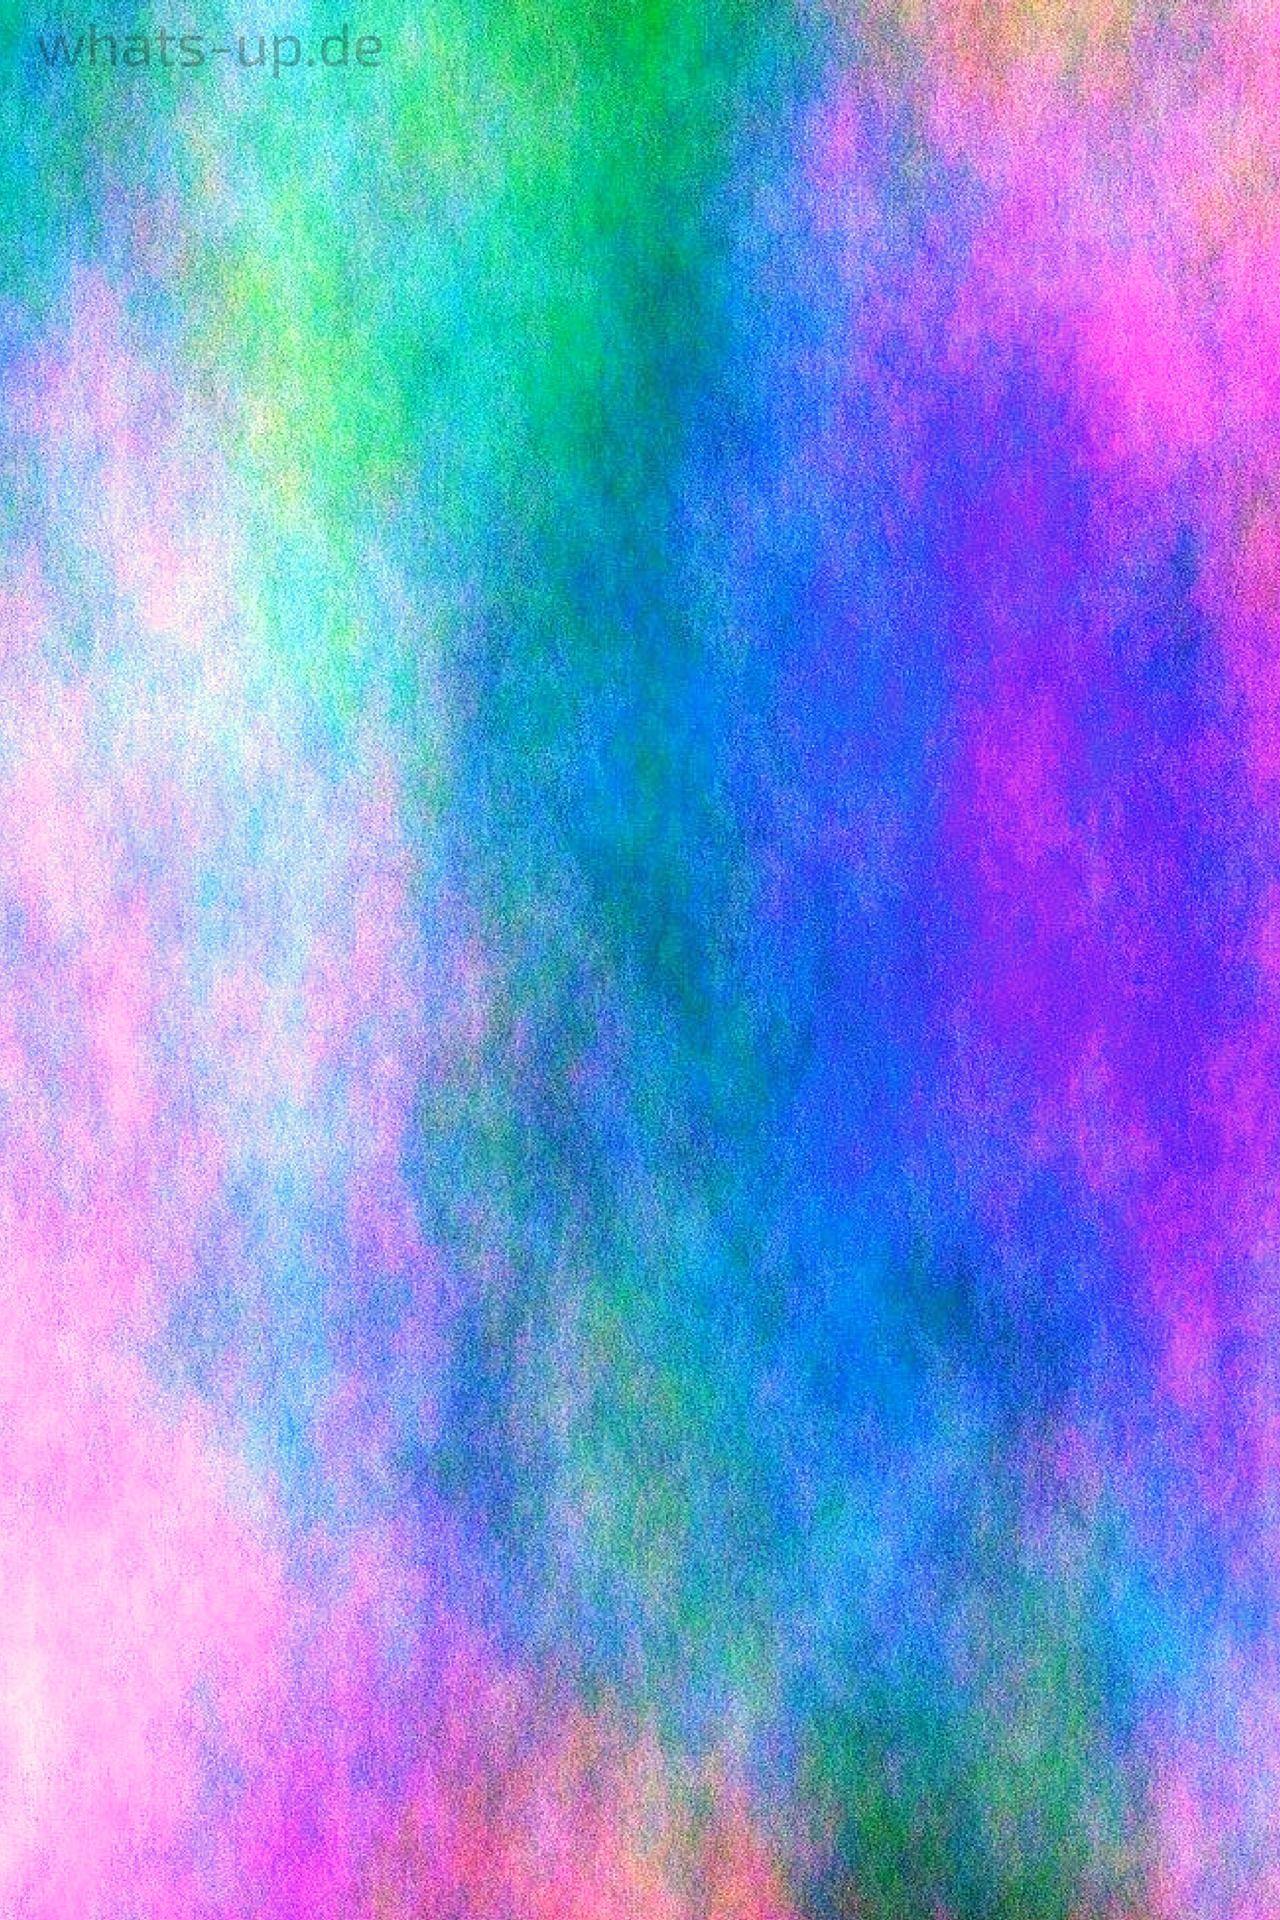 Aquarell Als Hintergrundbild Für Whatsapp Wallpaper Gratis